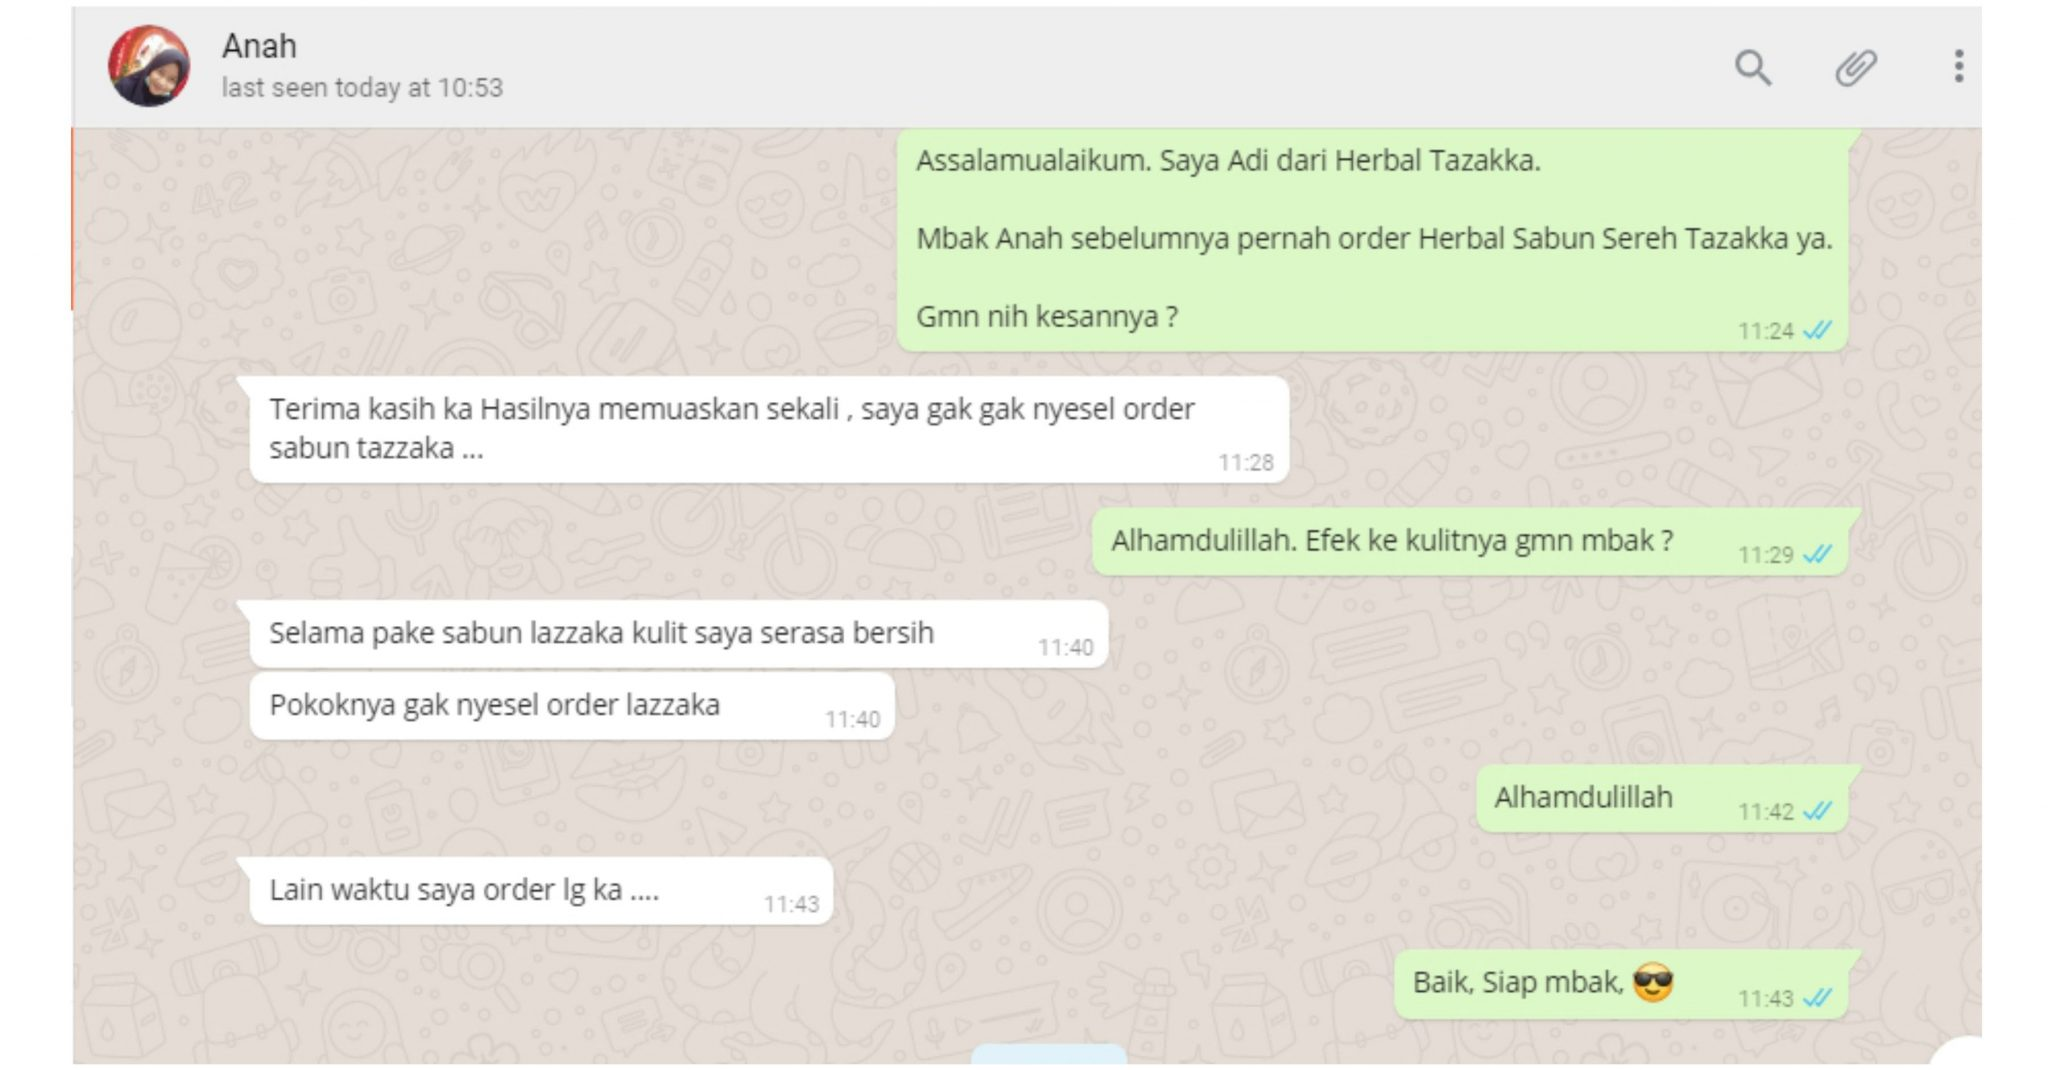 contoh foto gambar chatting wa bukti testimoni pelanggan produk sabun sereh herbal tazakka group enak dikulit terasa bersih.